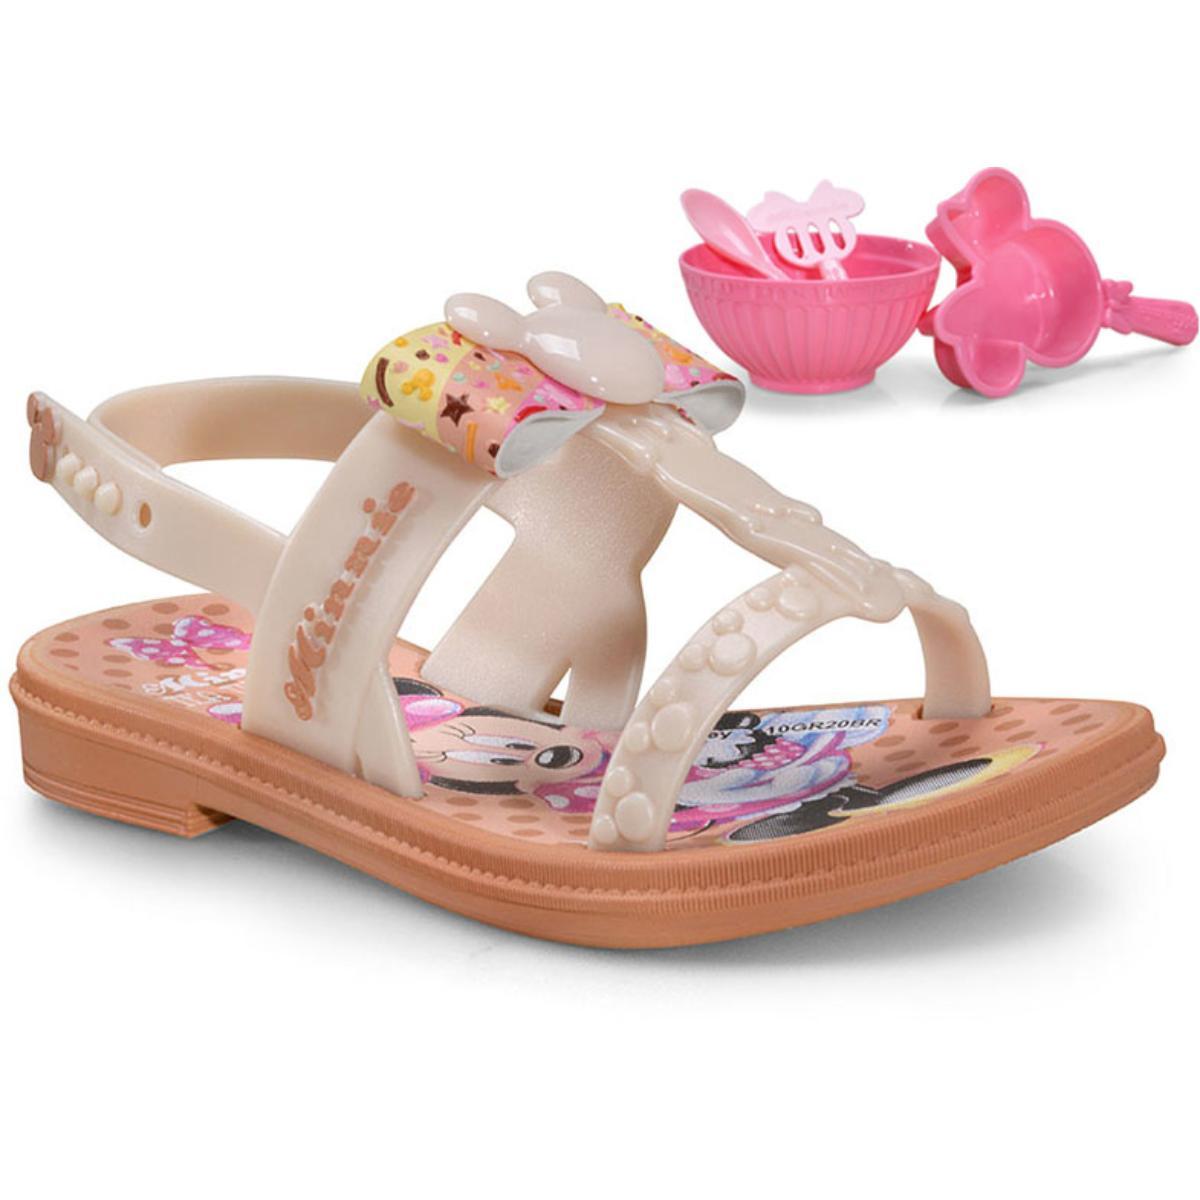 Sandália Fem Infantil Grendene 22417 20808 Minnie Little Rosa/bege